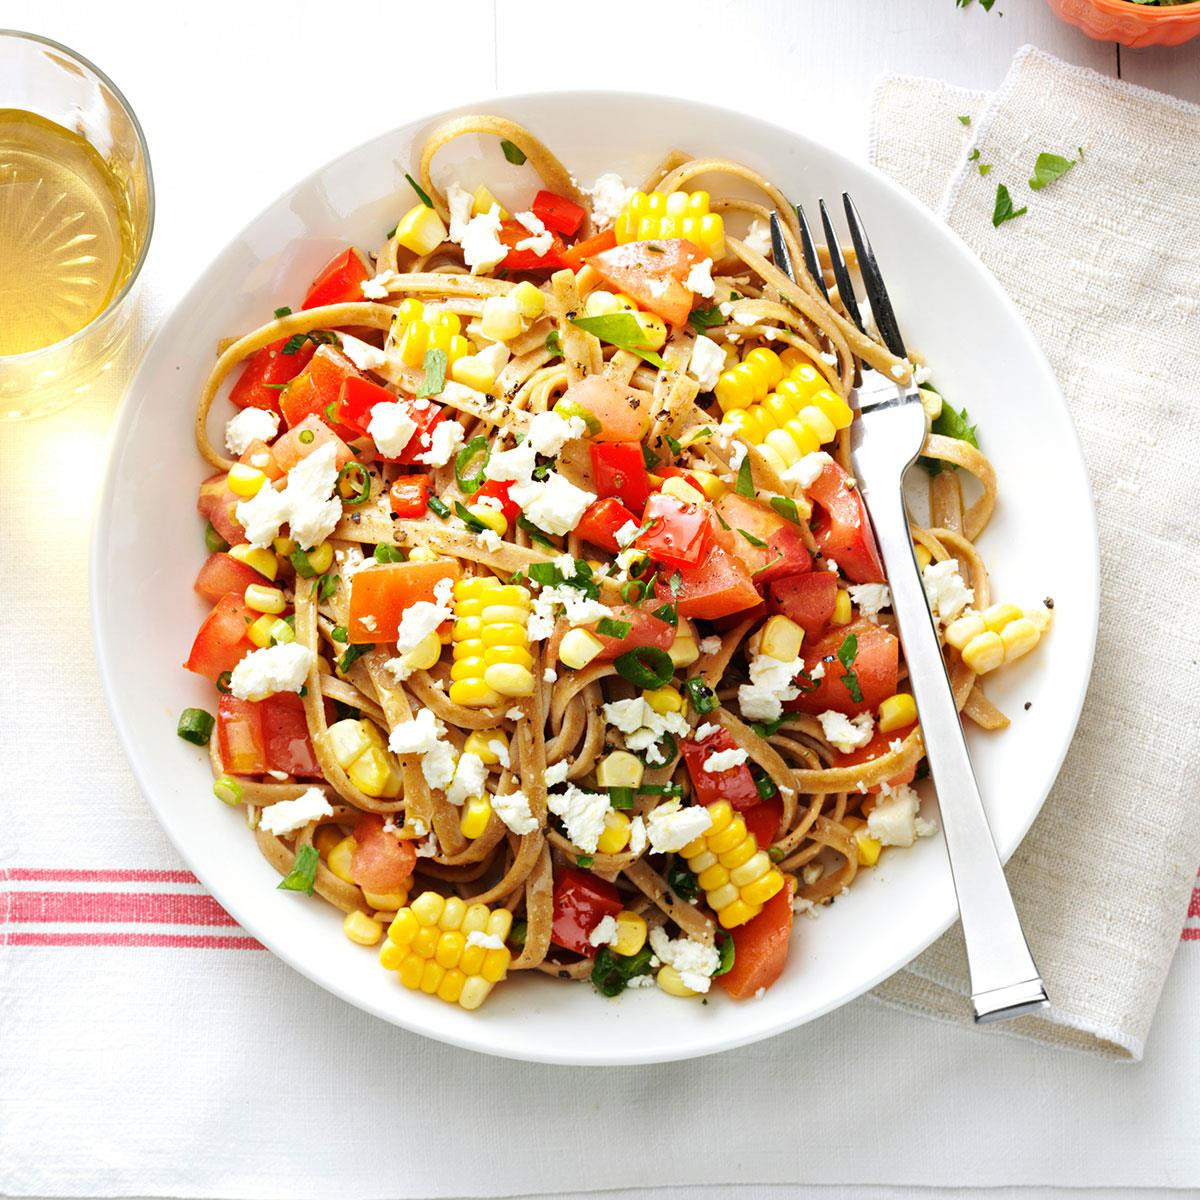 Healthy Dinners To Make At Home  Fresh Corn & Tomato Fettuccine Recipe